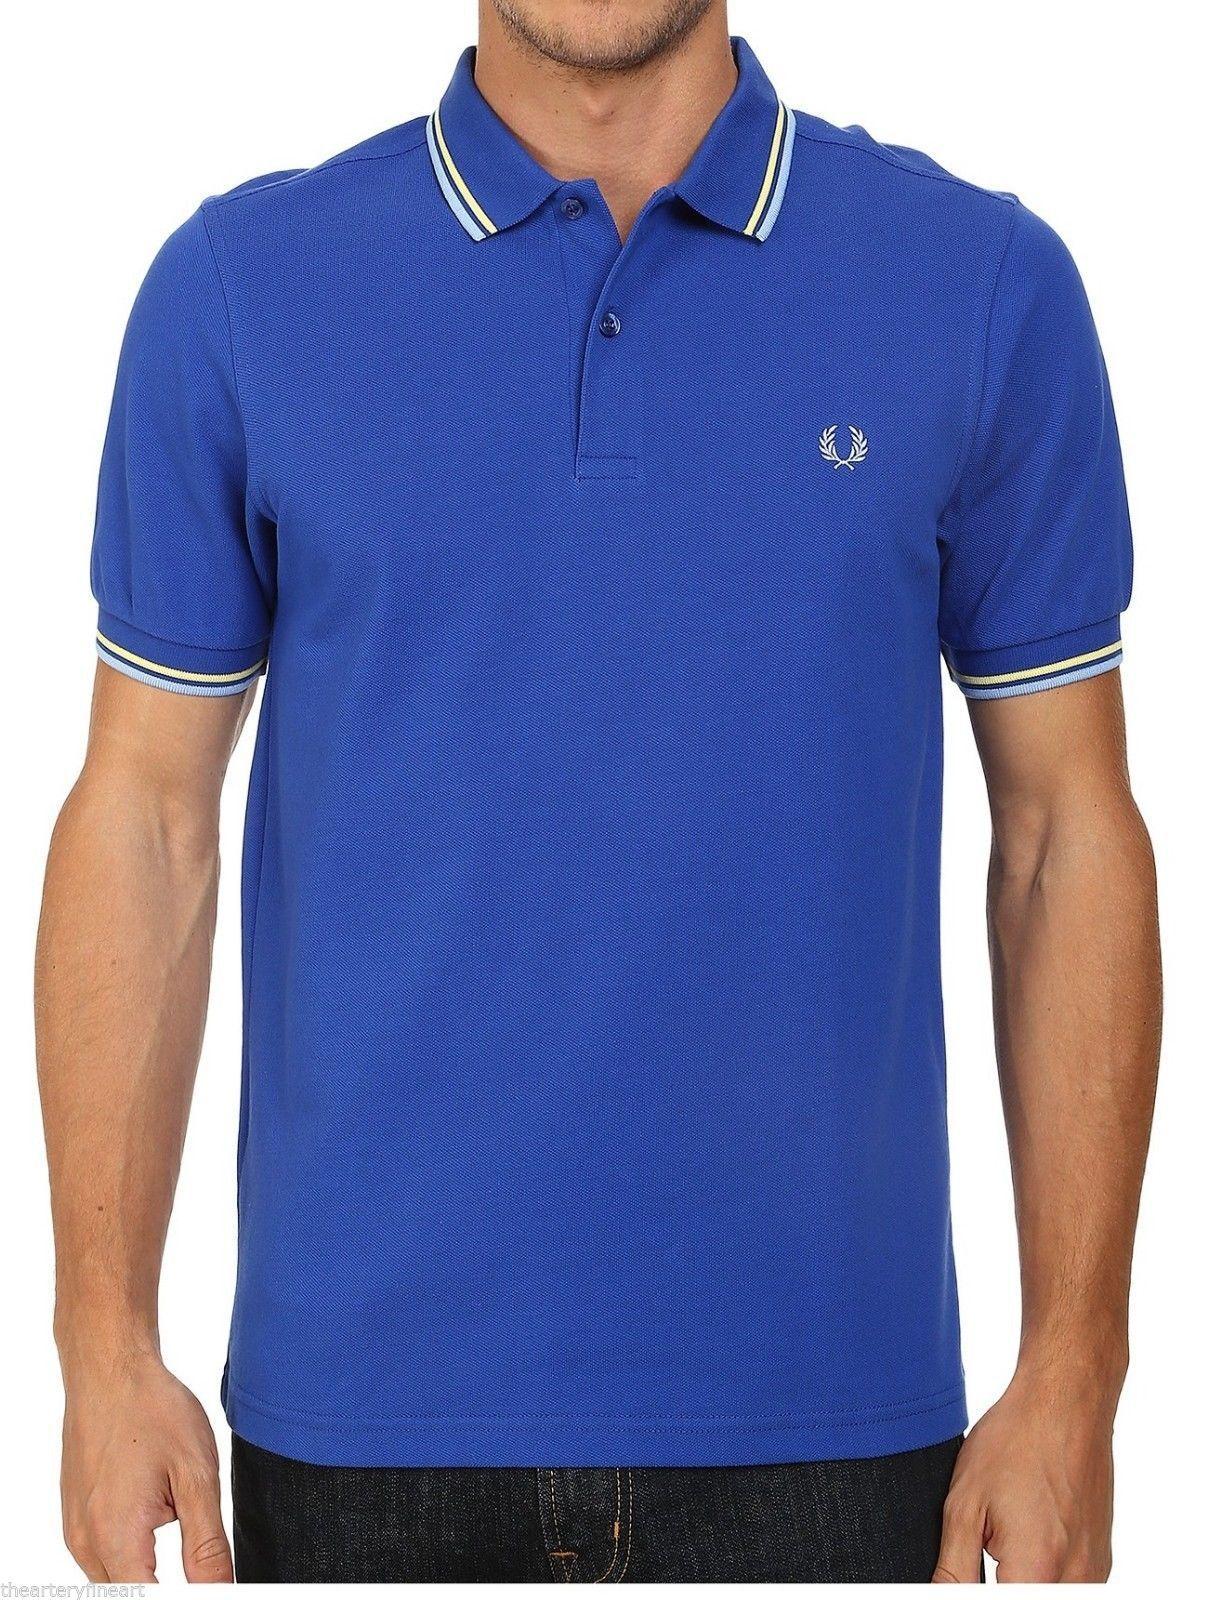 FRED PERRY Twin Tipped Piqué Polo Shirt M Regal bluee Ecru Sky Tip Slim Fit NWT